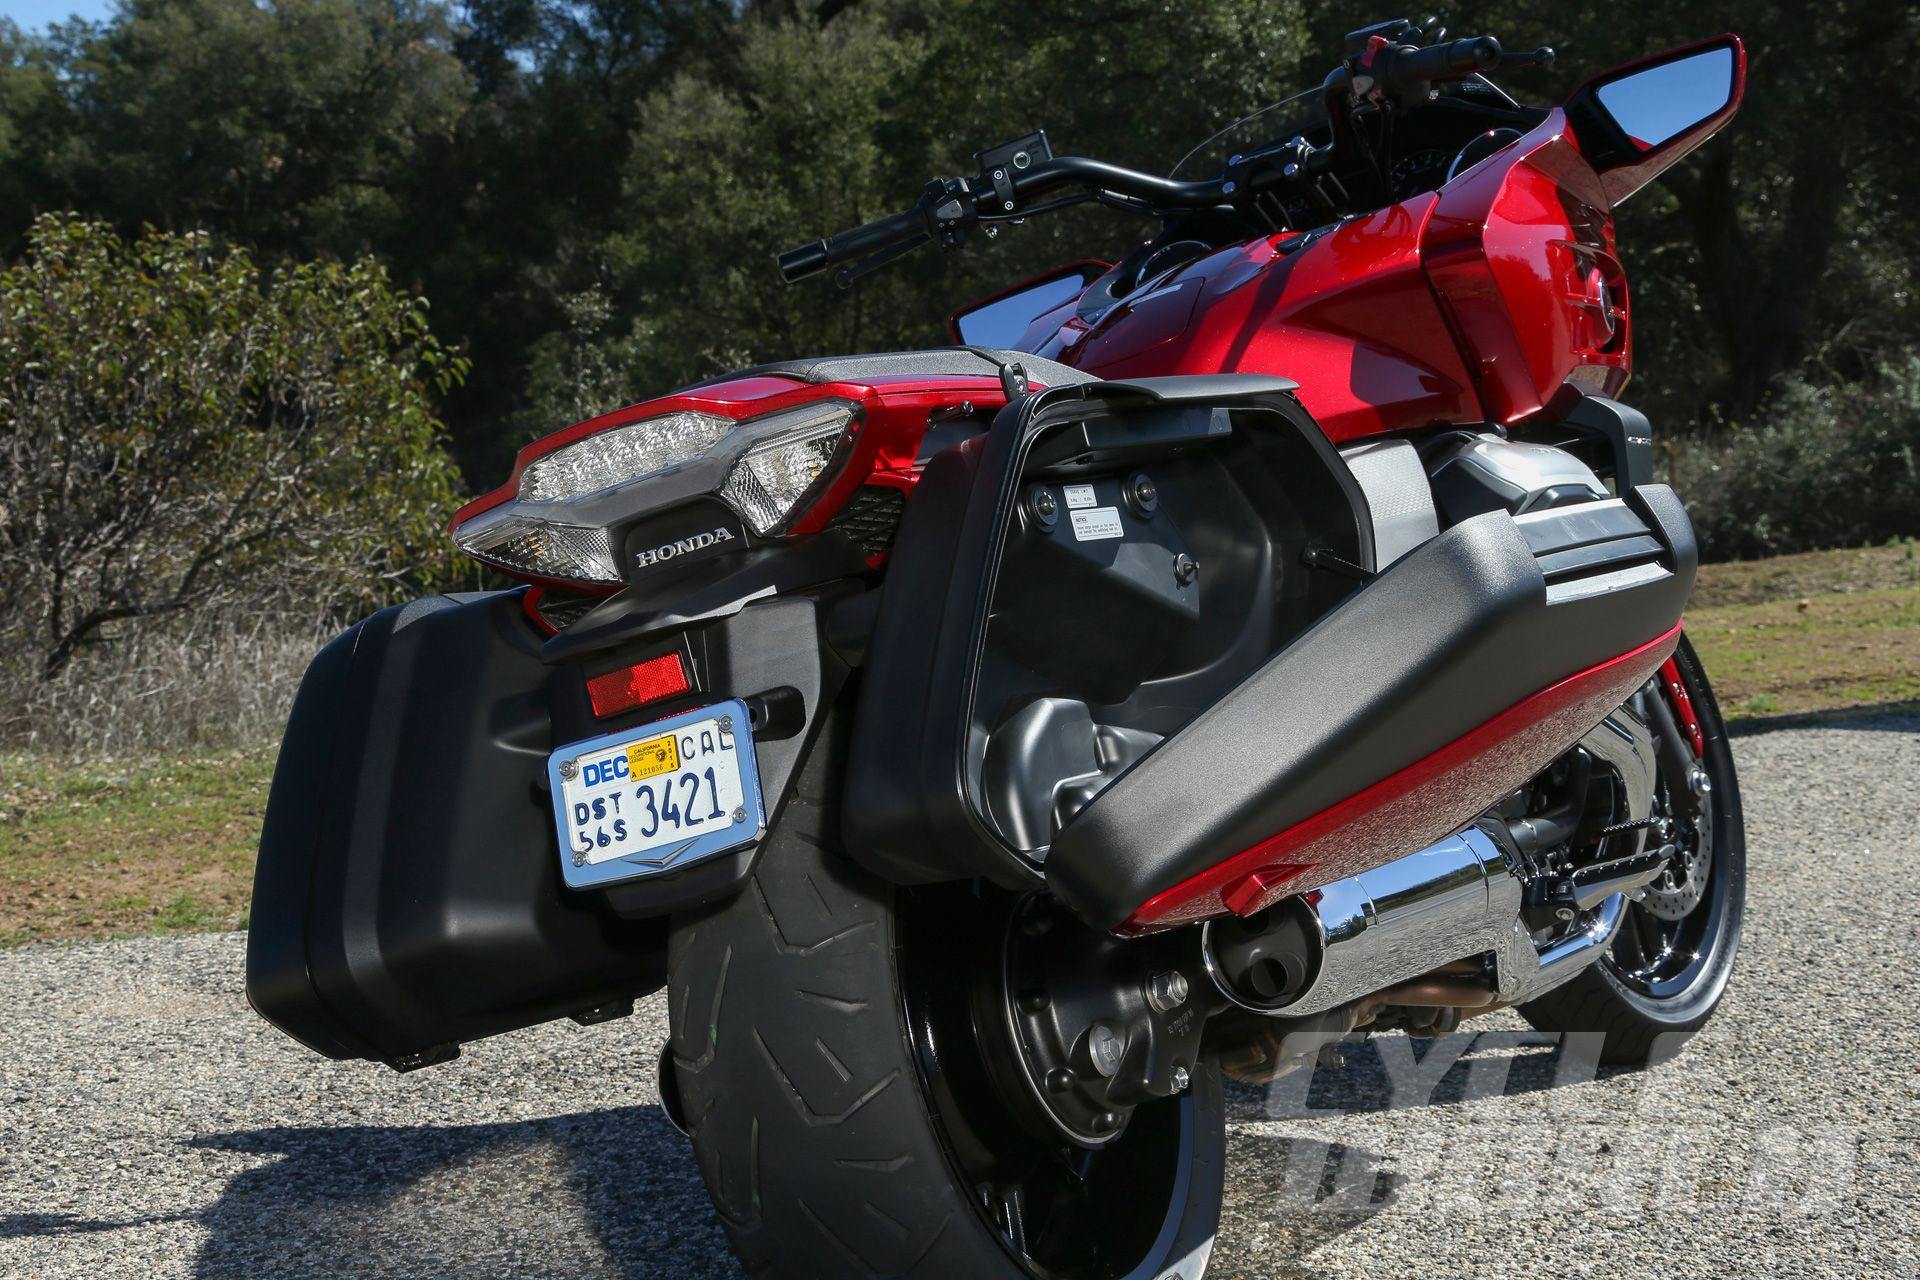 2014 Honda Ctx 1300 Saddlebags Open Rear View Touring Bikes